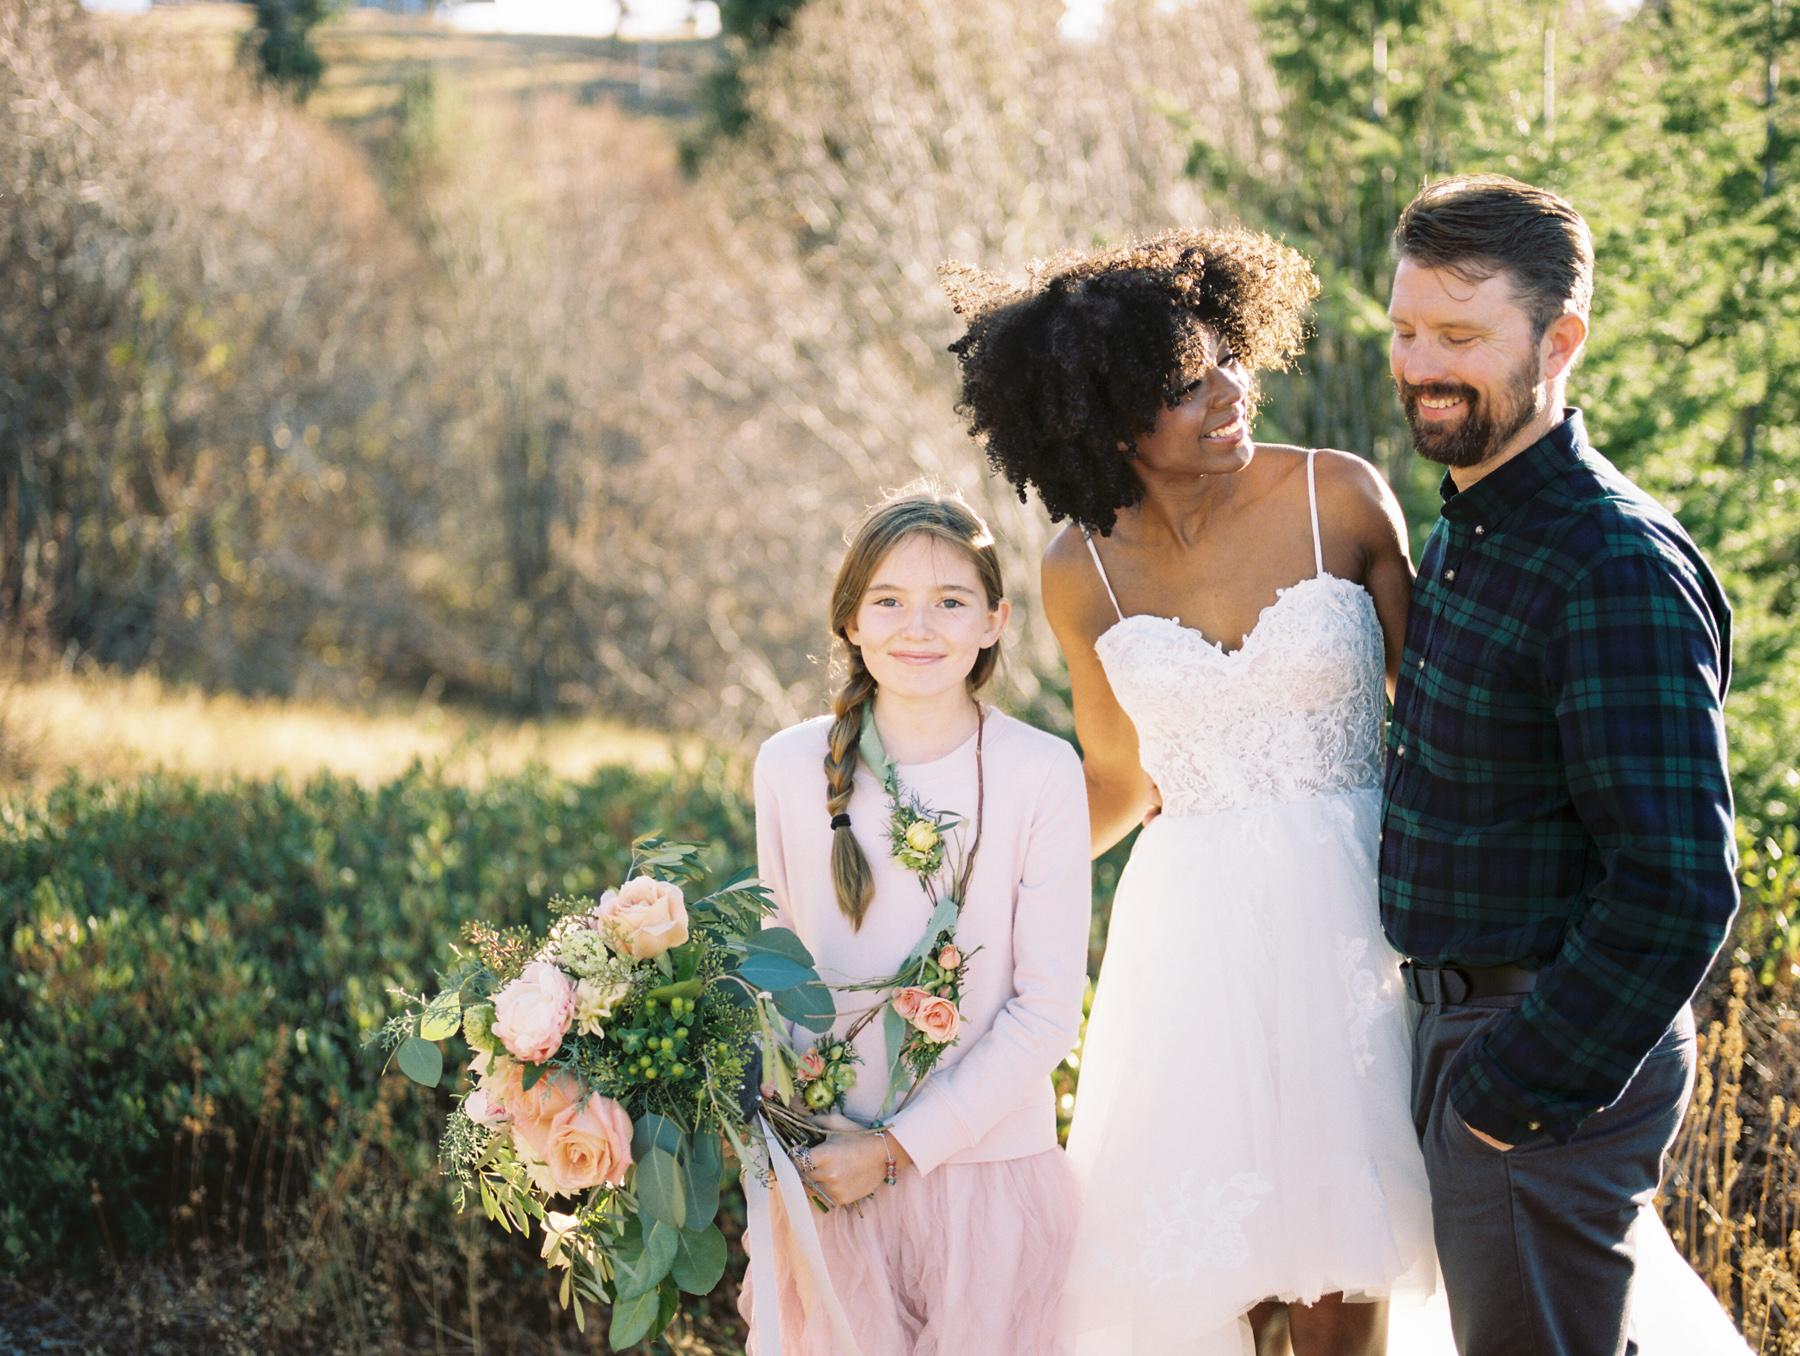 Ben+Joella_Marriage_03.jpg